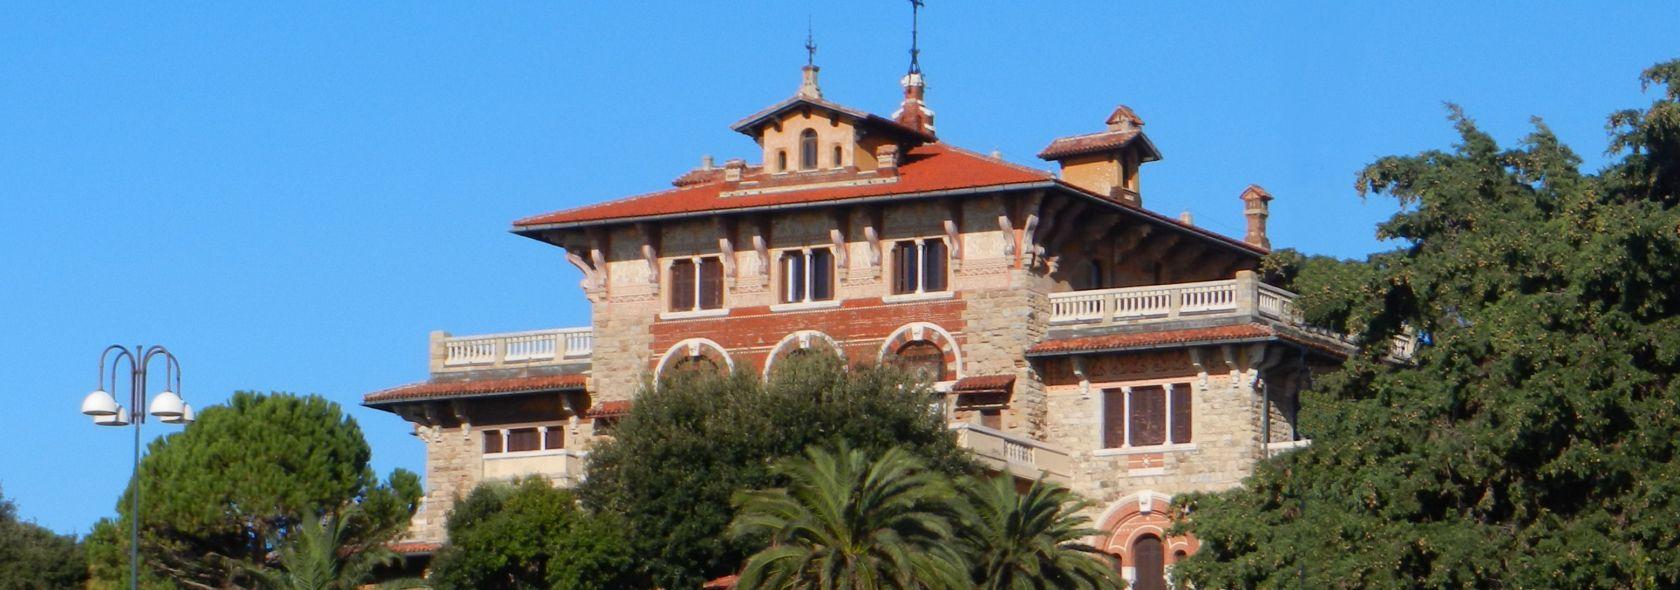 Villa Canali Gaslini